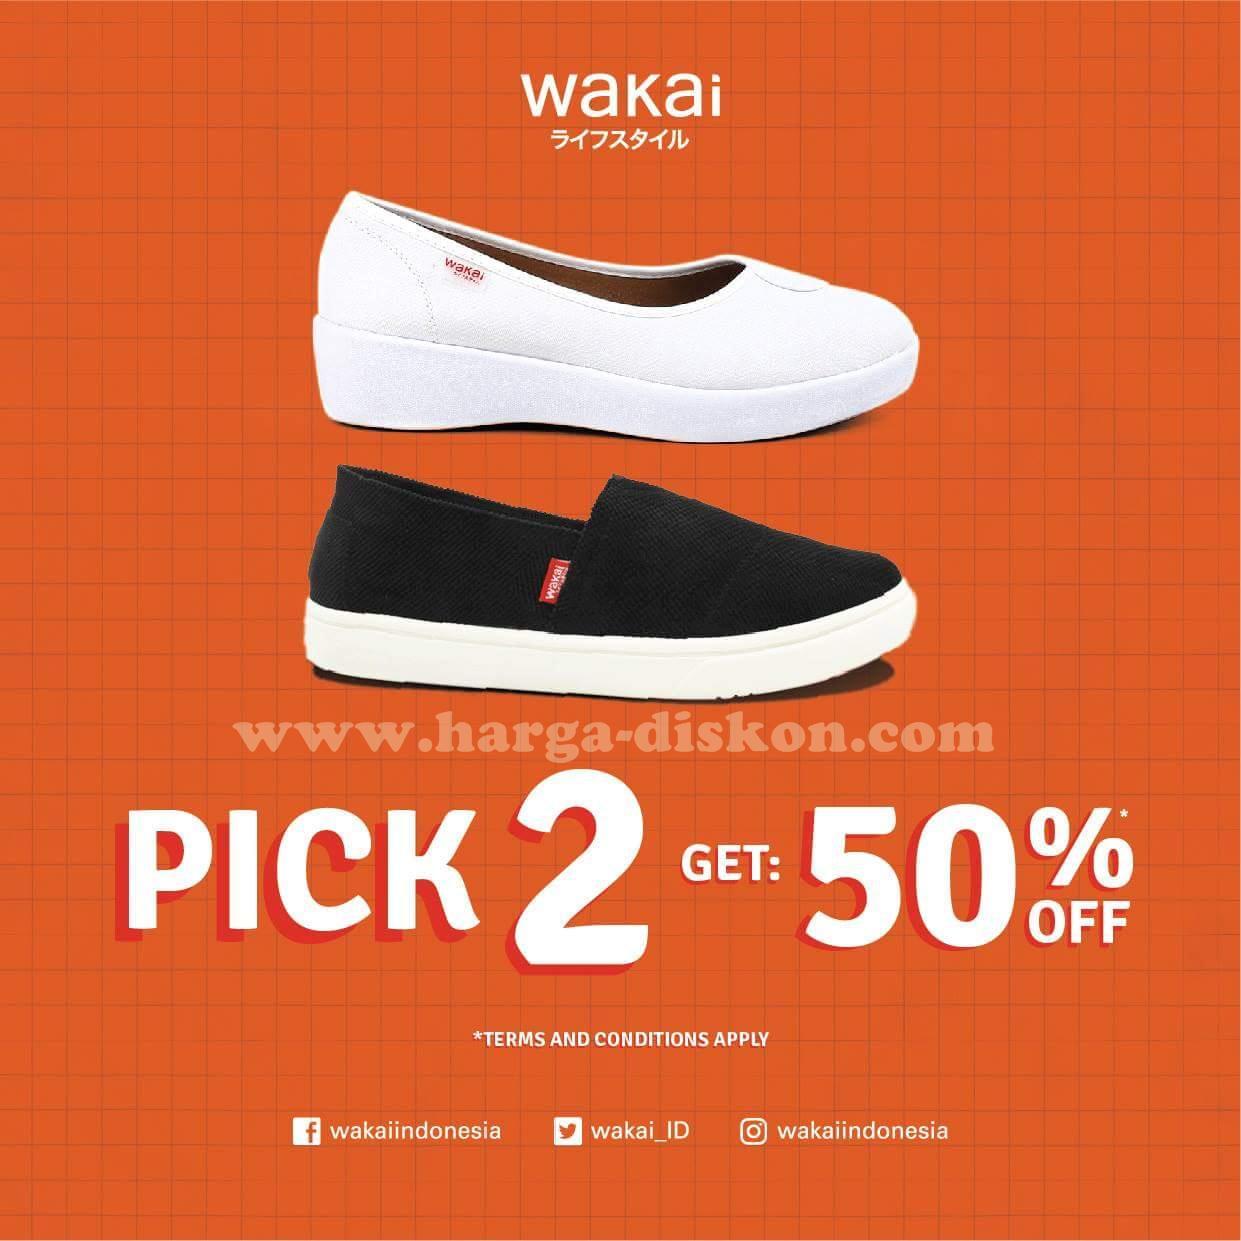 Dapatkan penawaran spesial dari Wakai : Beli 2 produk